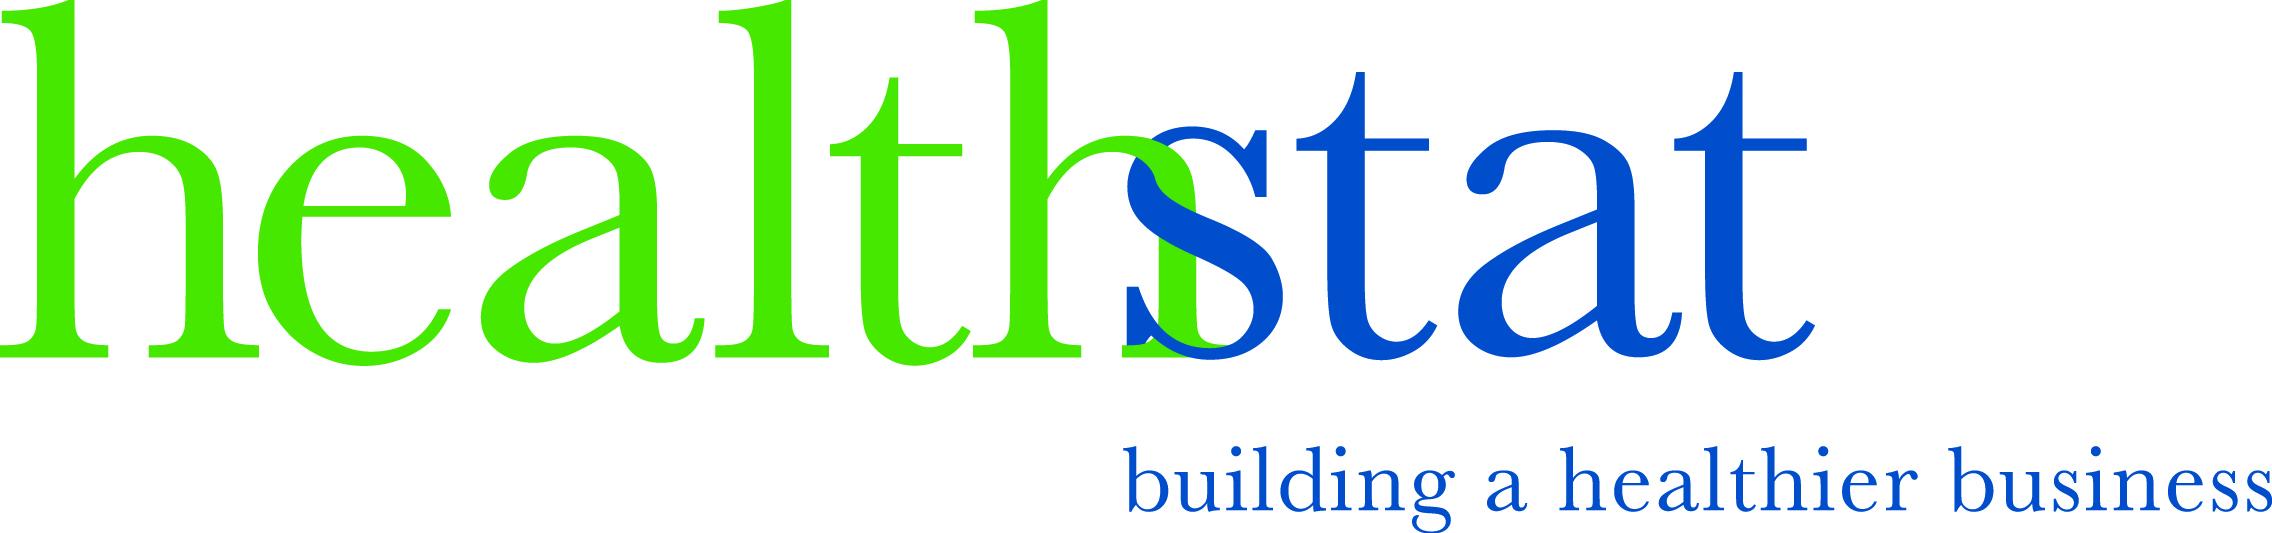 Healthstat, Inc.